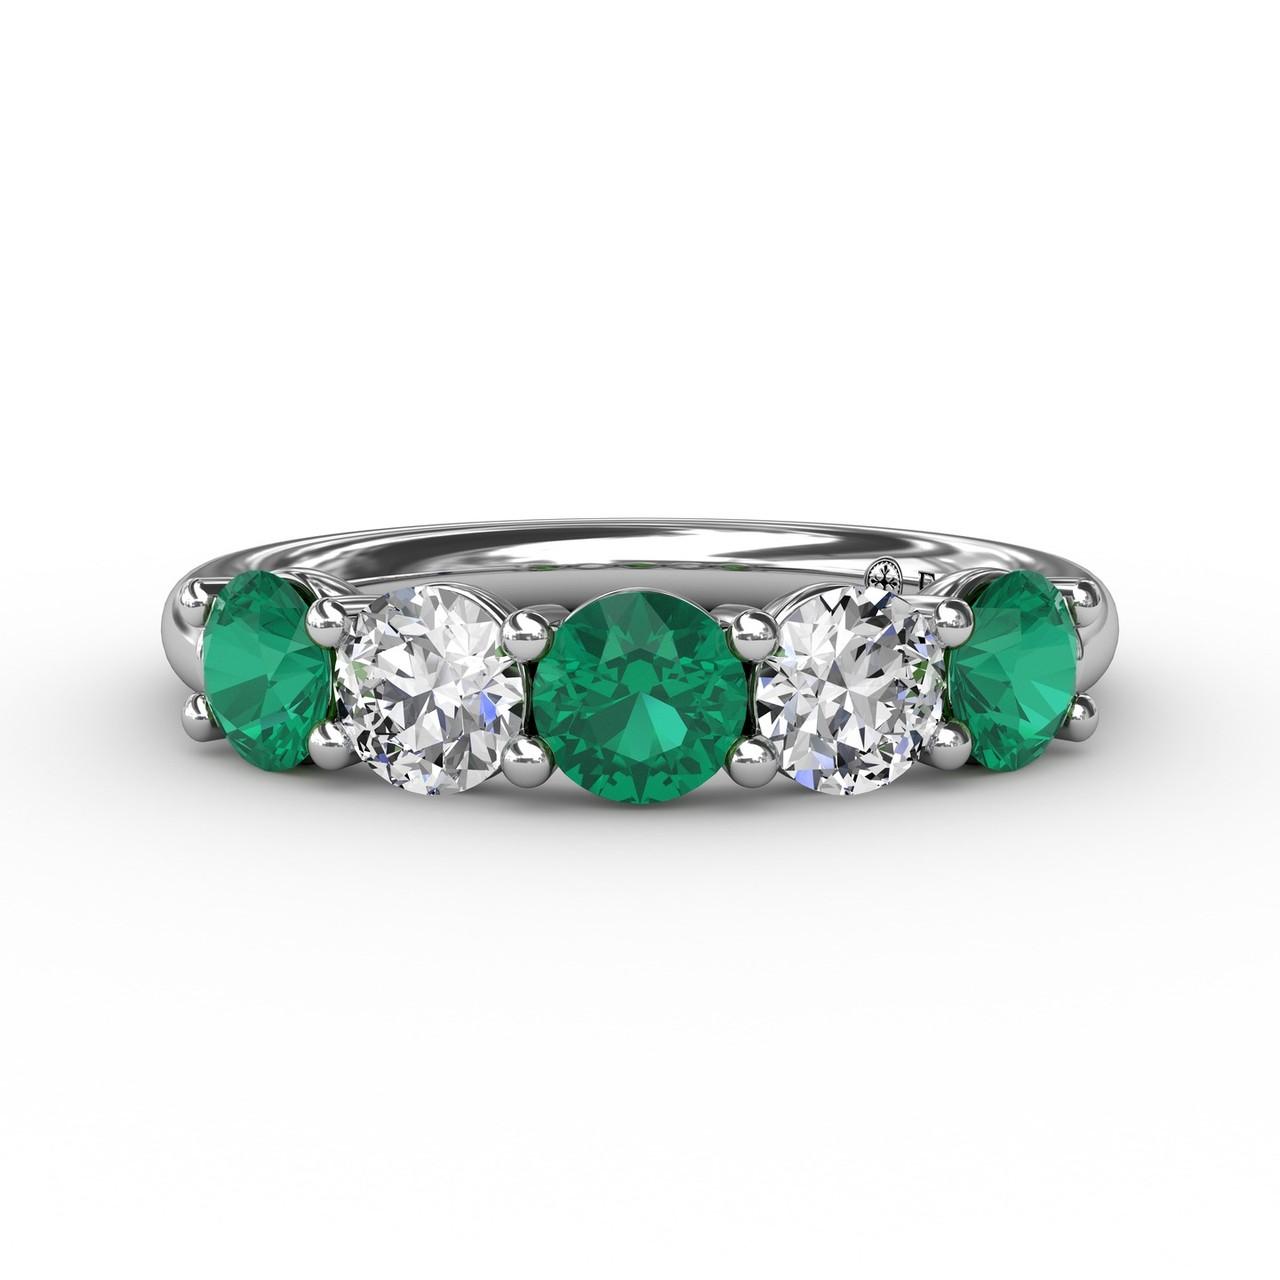 Chunky Emerald and Diamond Shared Prong Anniversary Band